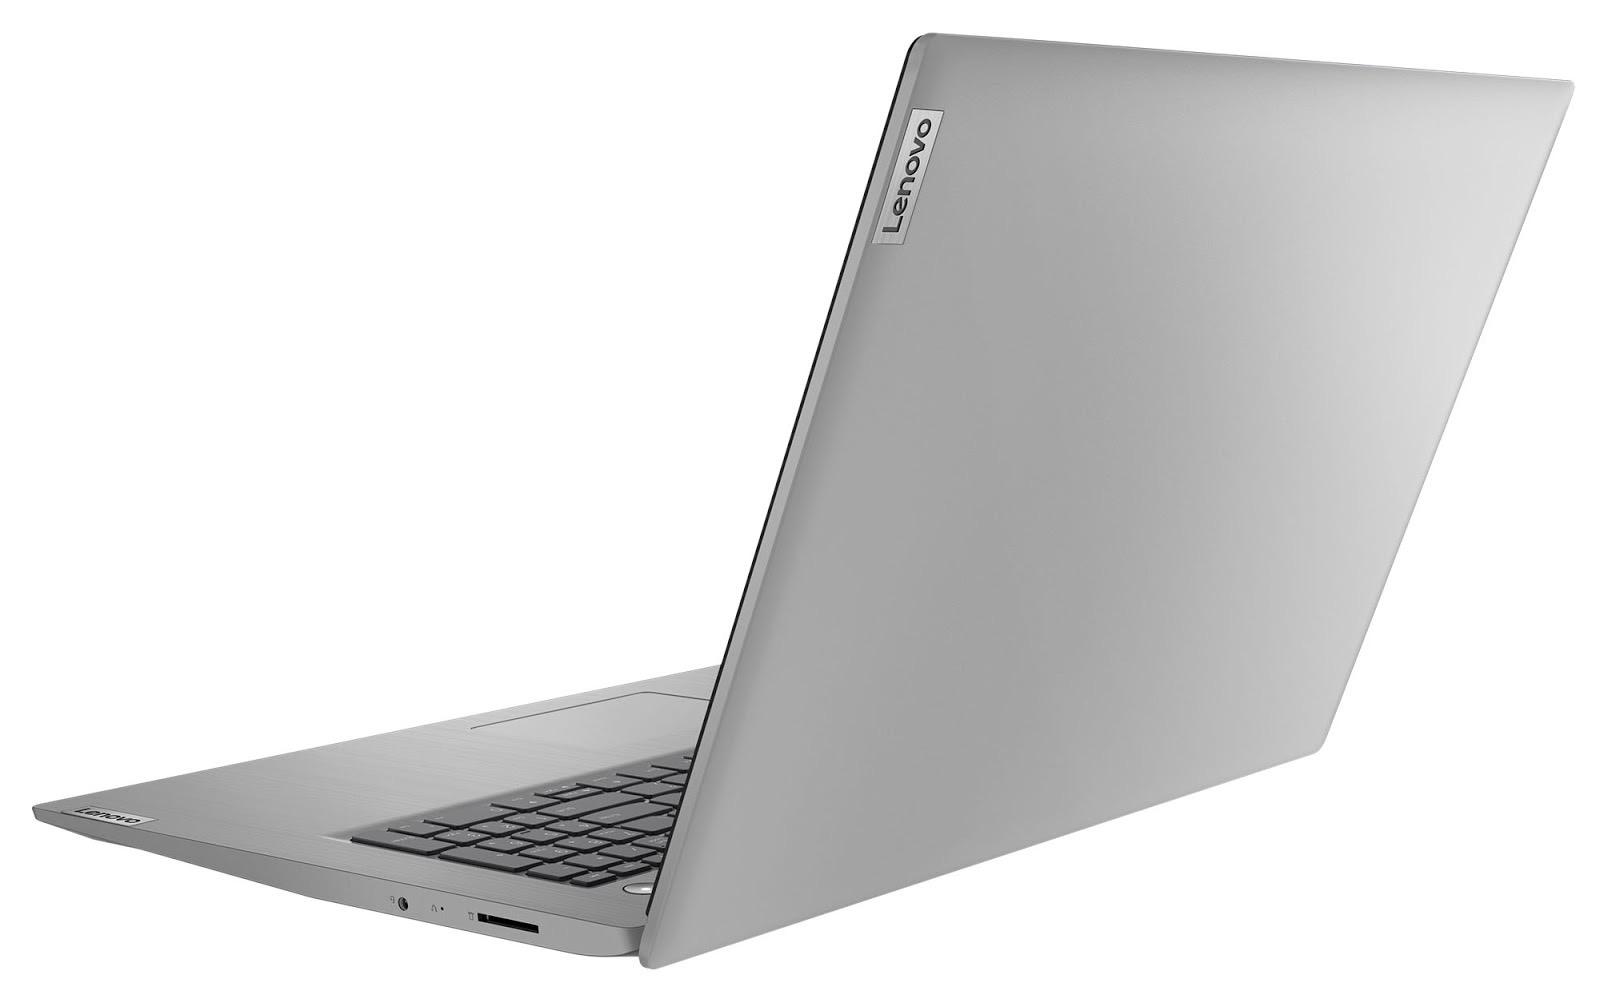 Фото 1. Ноутбук Lenovo ideapad 3 17ADA05 Platinum Grey (81W20021RE)